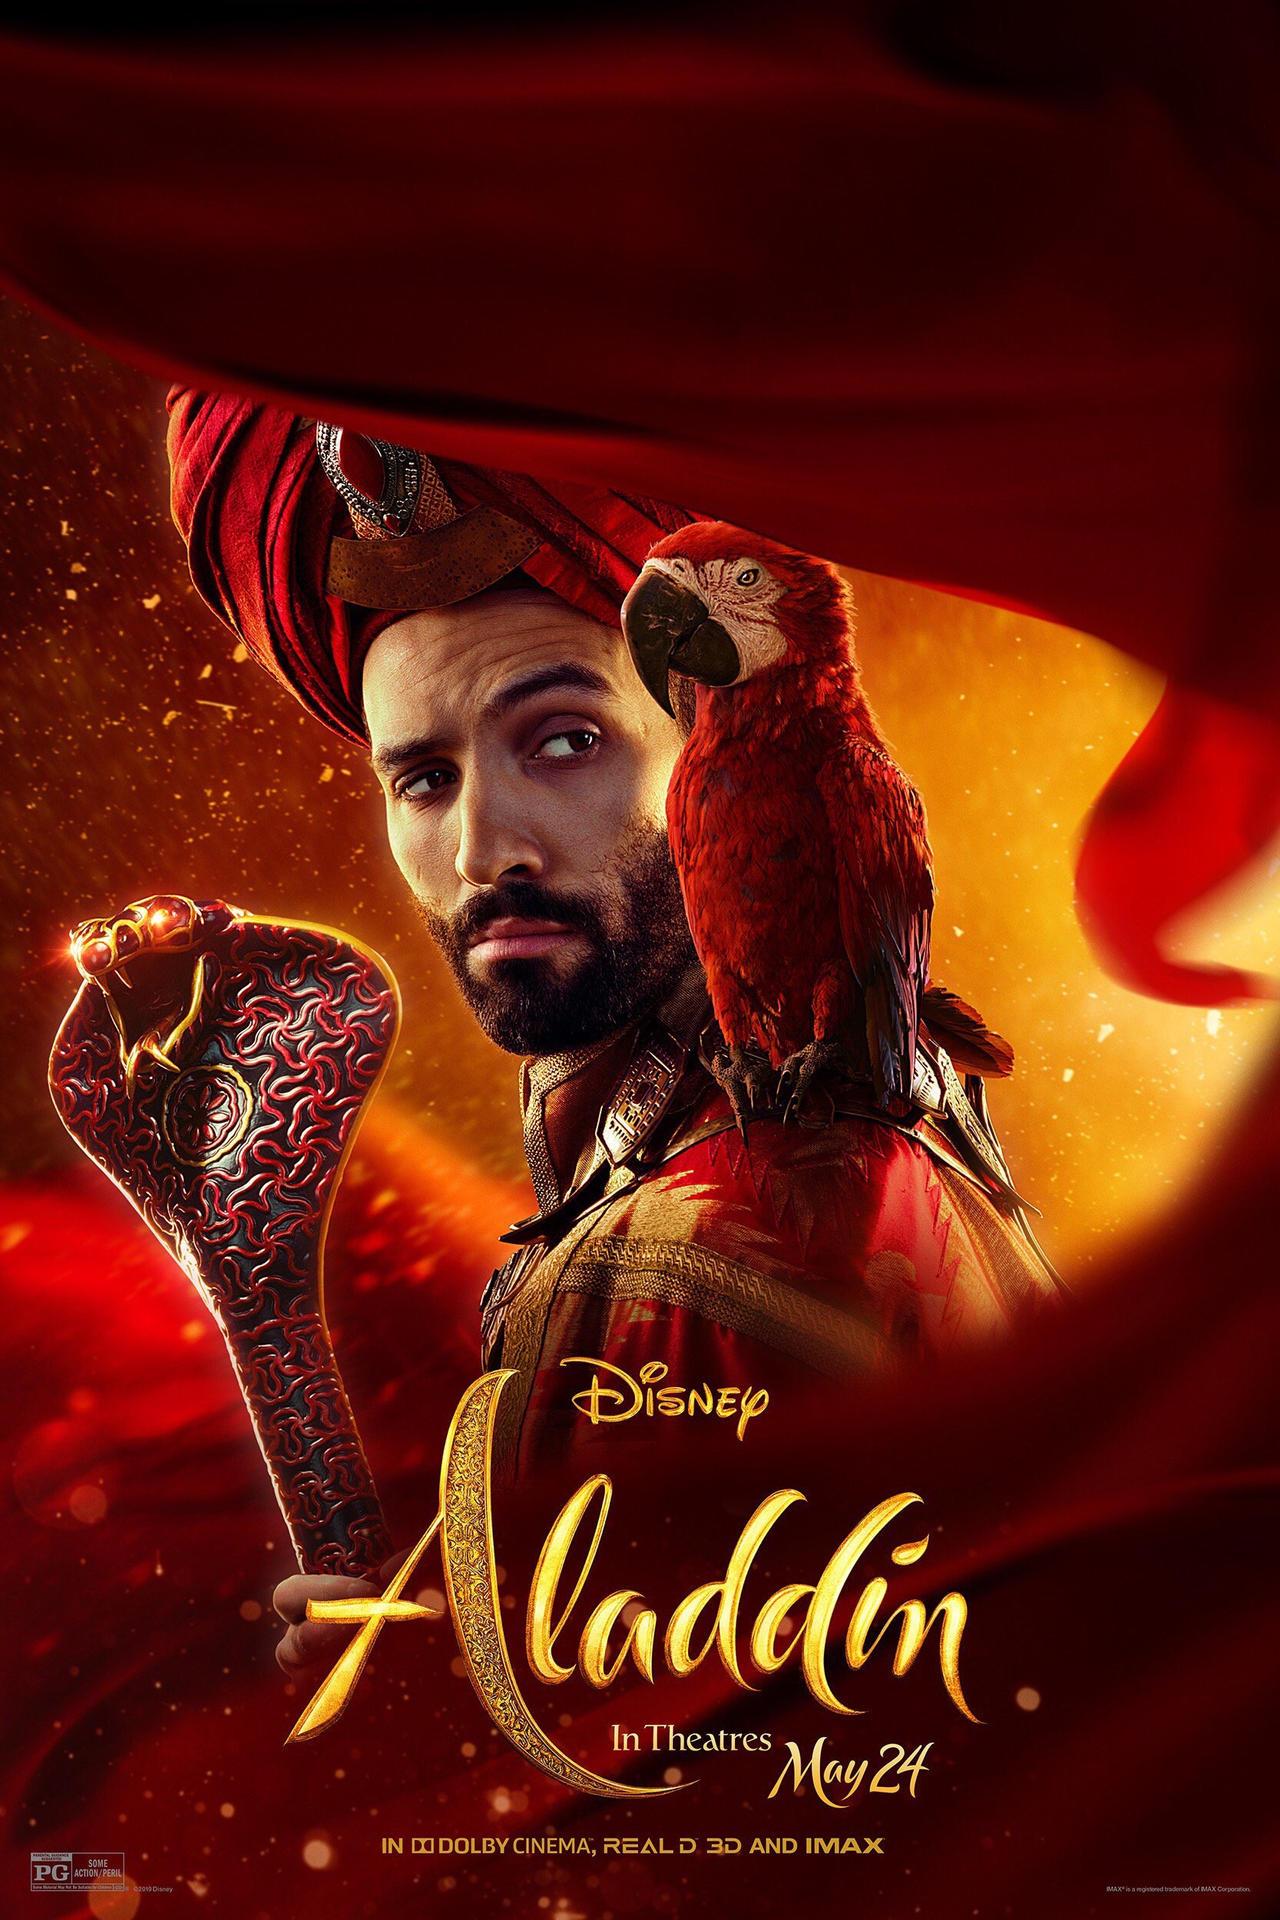 Disneys aladdin 2019 jafar poster by artlover67 on deviantart - Aladdin 2019 poster ...